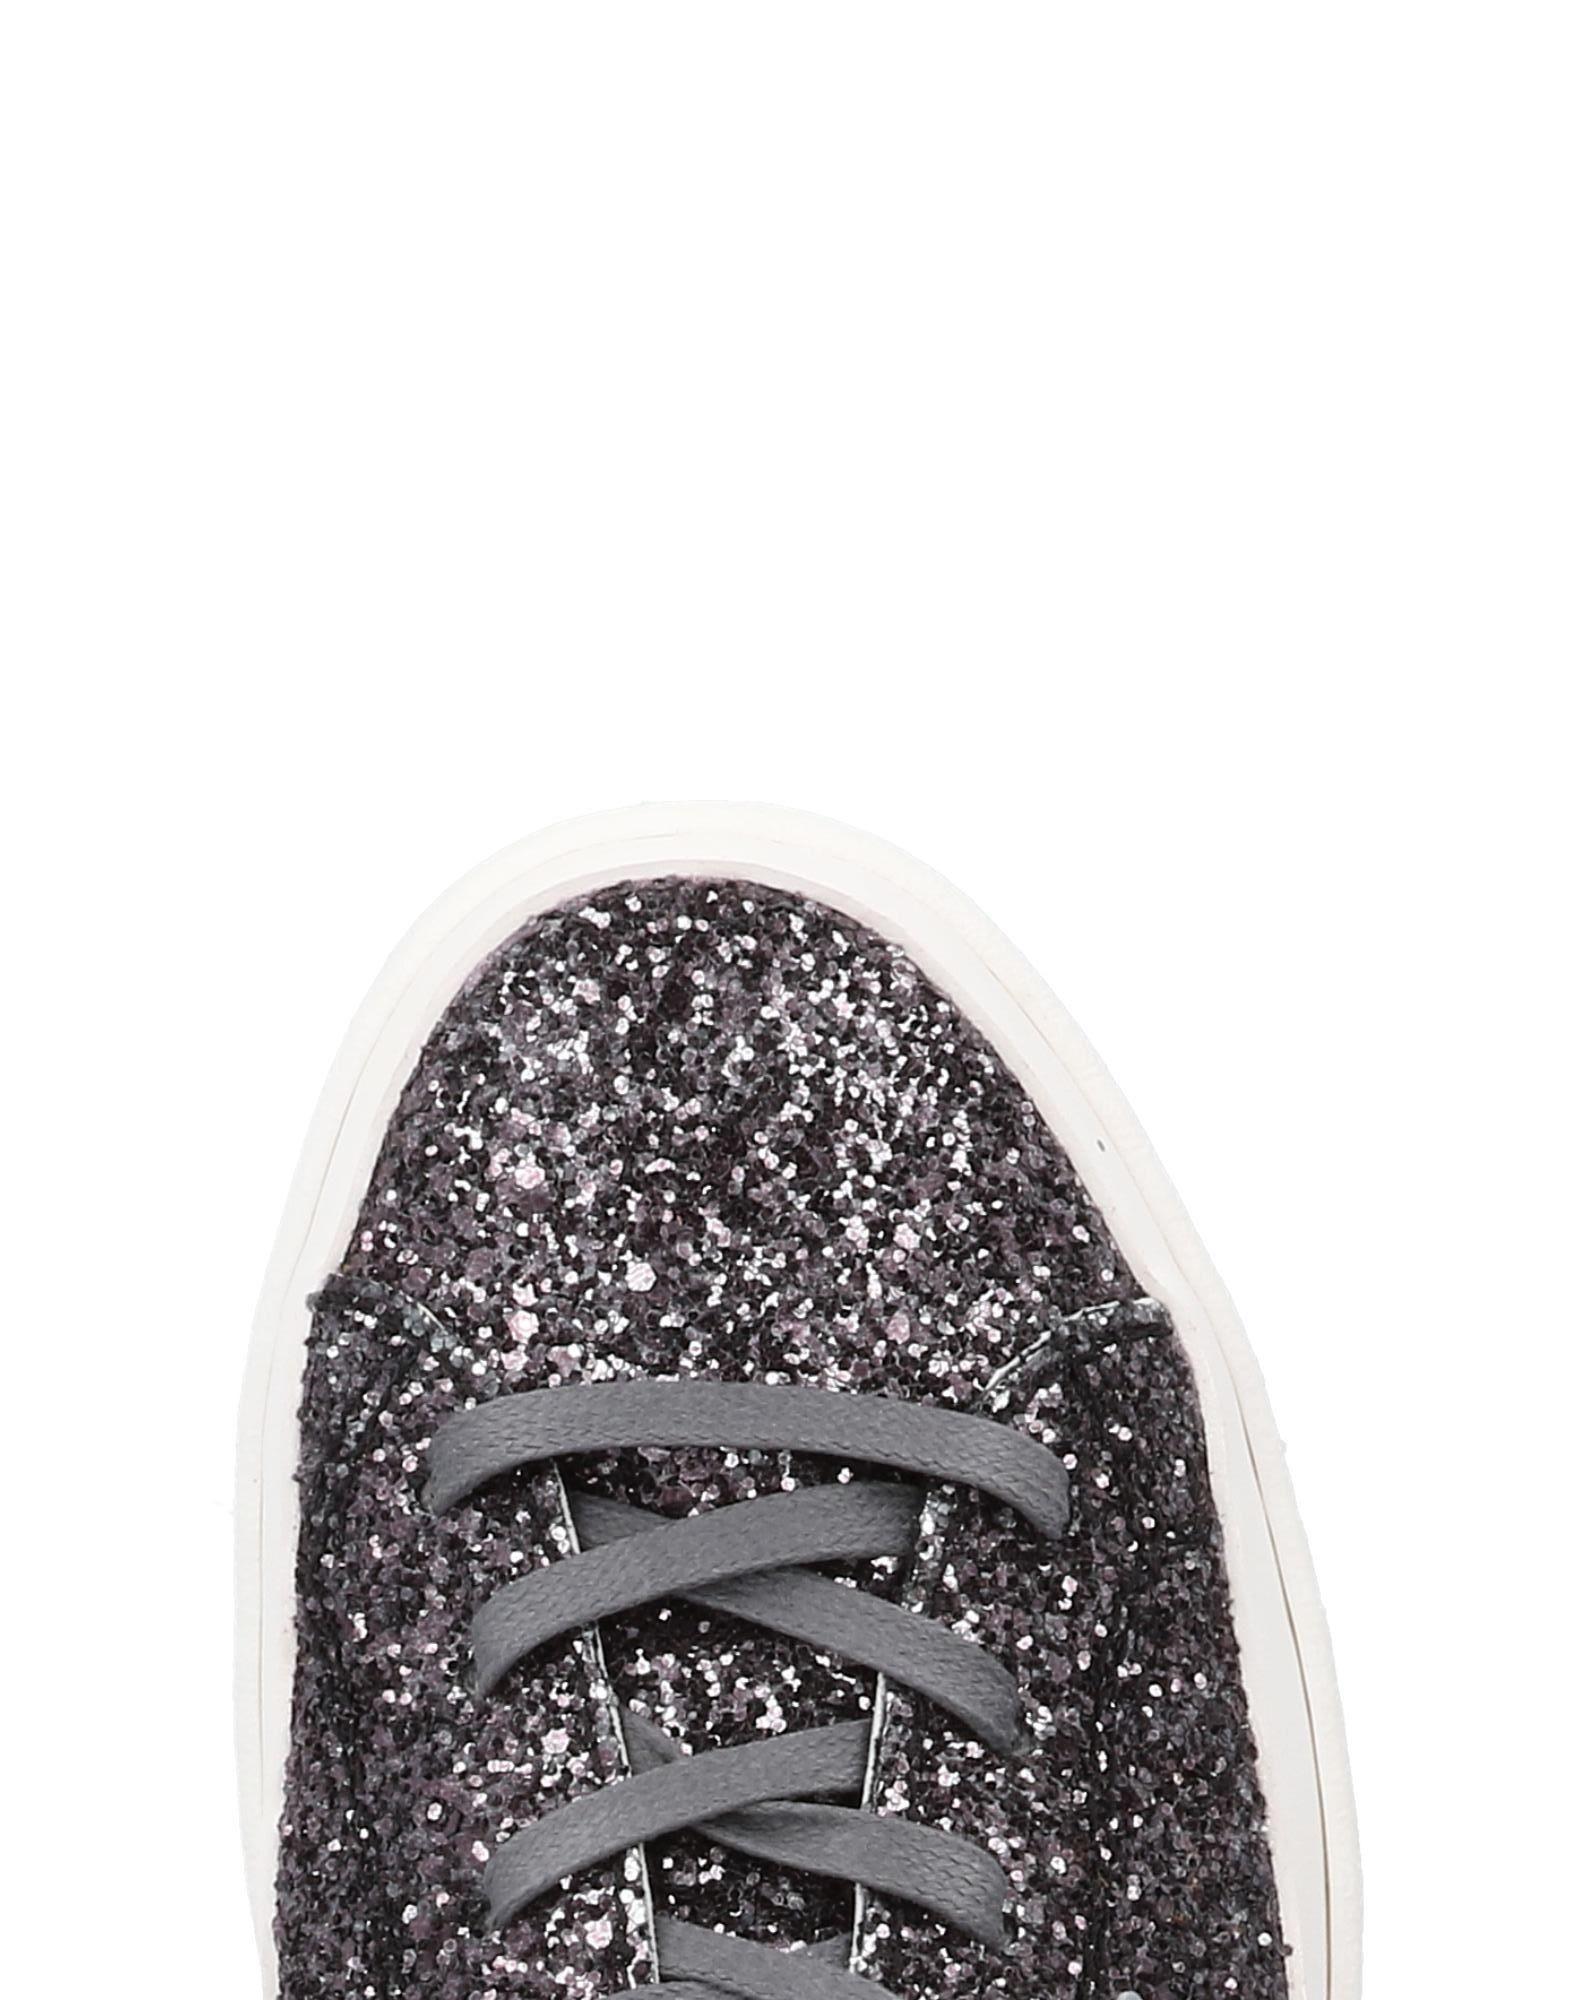 Philippe Model Sneakers Damen strapazierfähige  11459504XBGut aussehende strapazierfähige Damen Schuhe 9a6a05